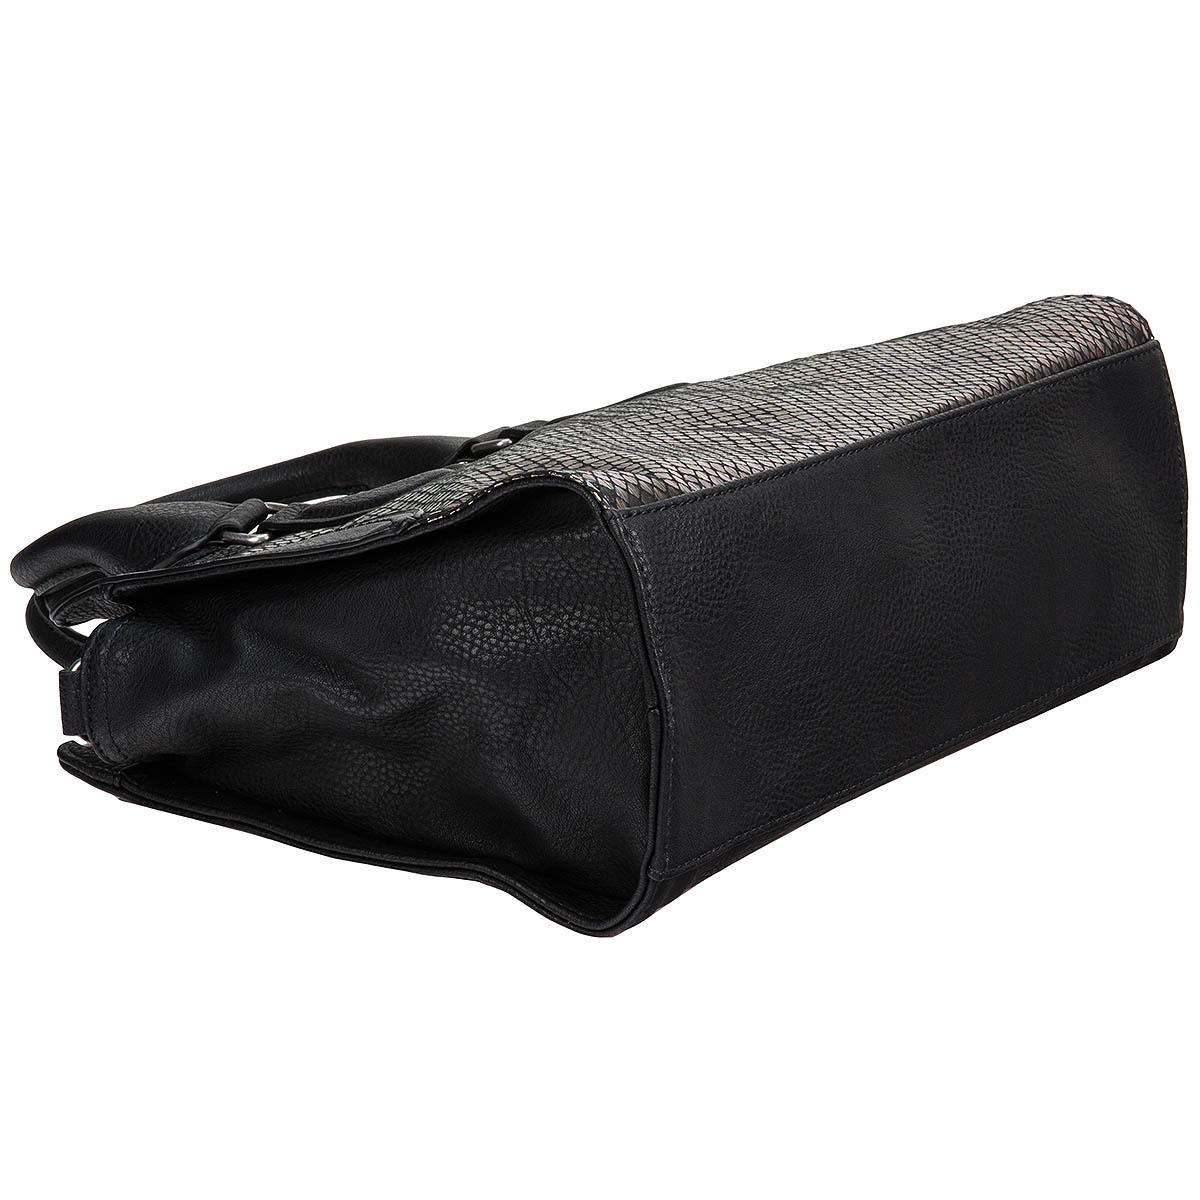 ac41edf600a4c Tamaris Vanja Tasche Handtasche Henkeltasche Bowling Bag 1379162-098 ...